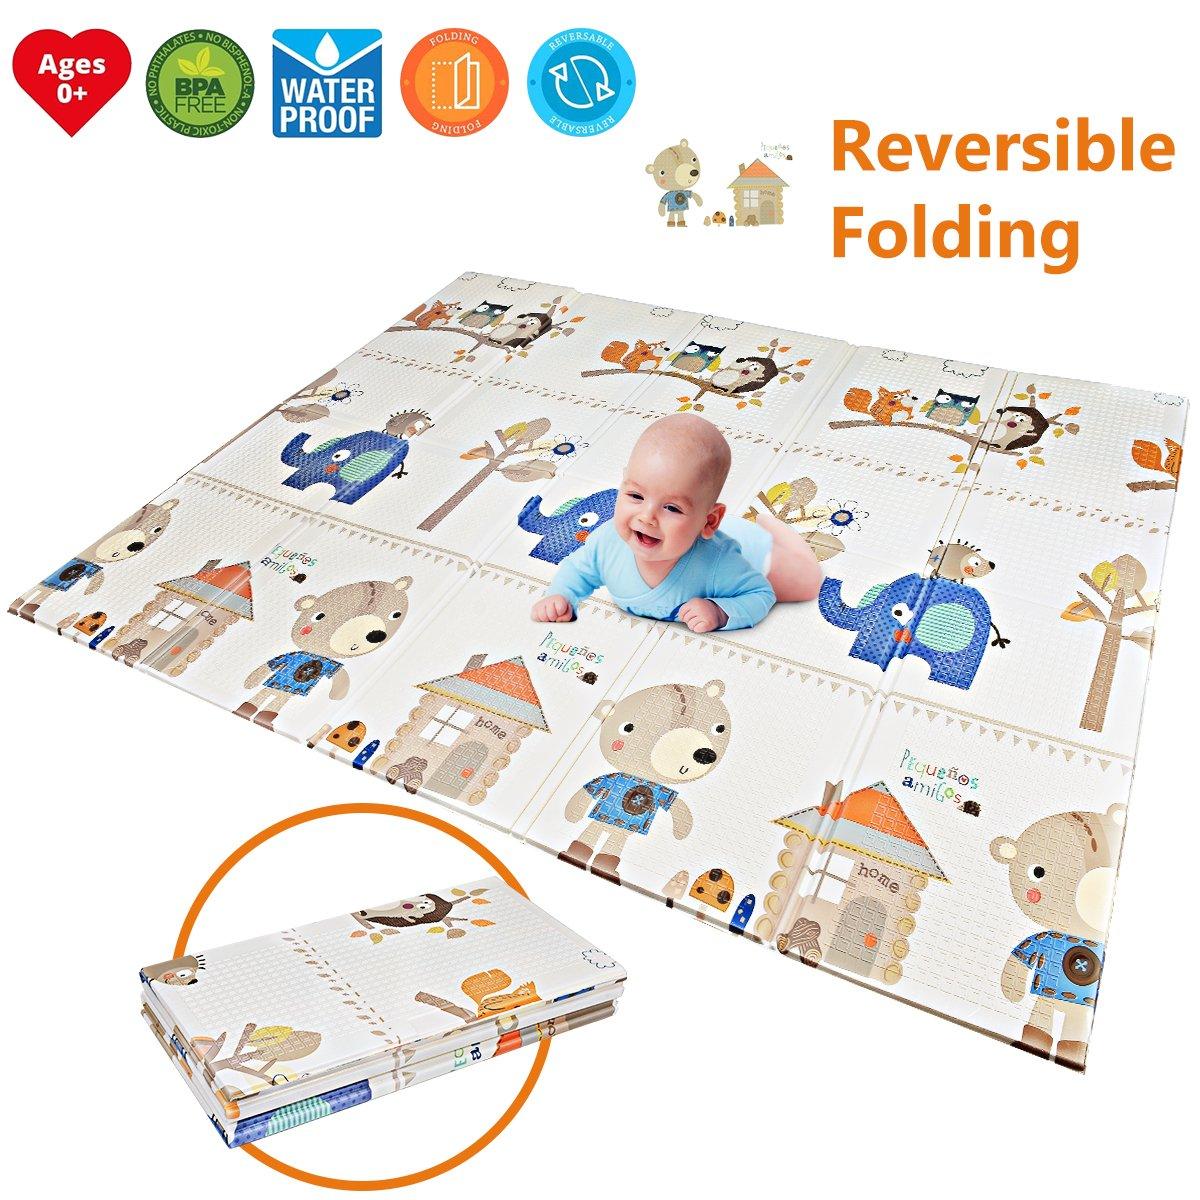 "Folding Kids Play Mat | Portable Baby Play Mat | BPA FREE Non Toxic 78.7"" x 59 0.4 Extra Large Reversible Foam Crawling Mat Toddlers Waterproof Non-Slip Picnic Outdoor Playroom Forstart ML-A02PAN-PM02"